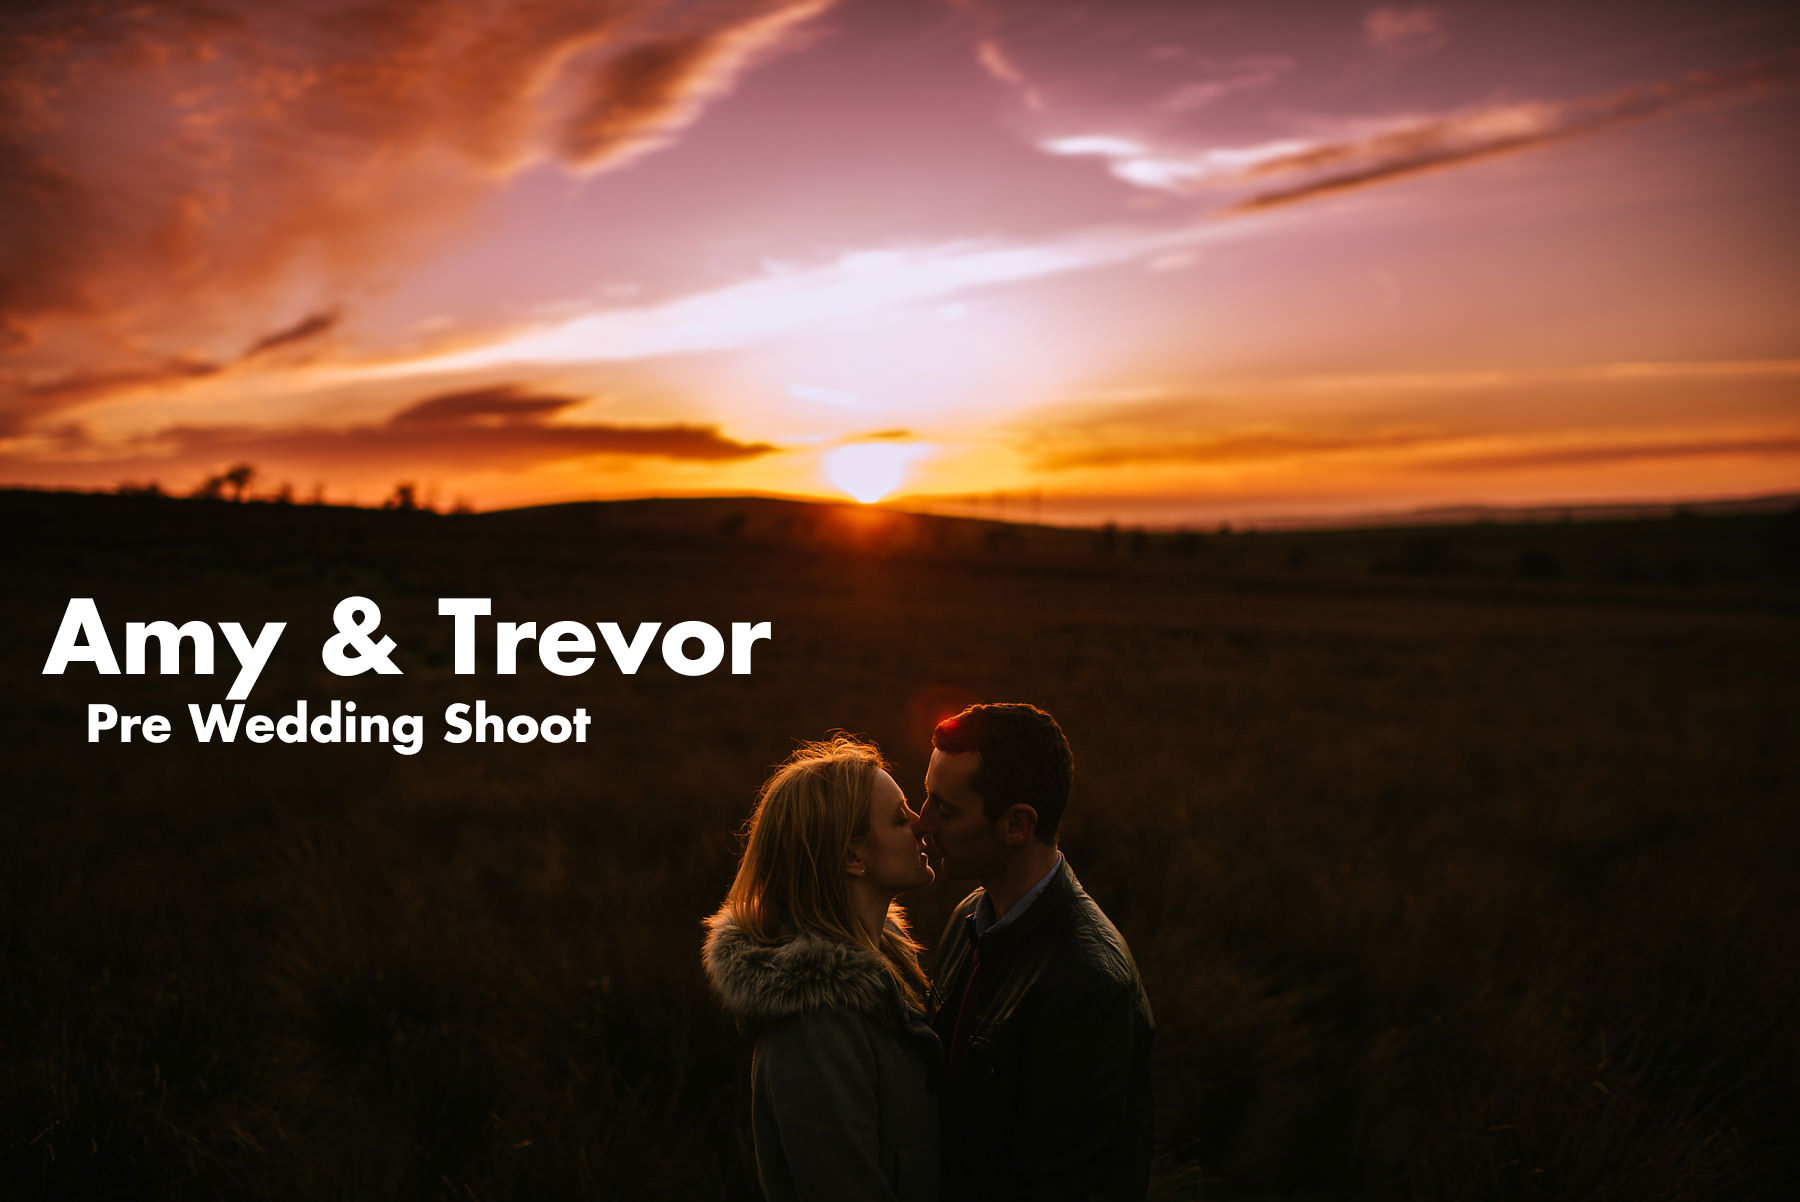 amy trevor wedding photographer ribble valley 0 title